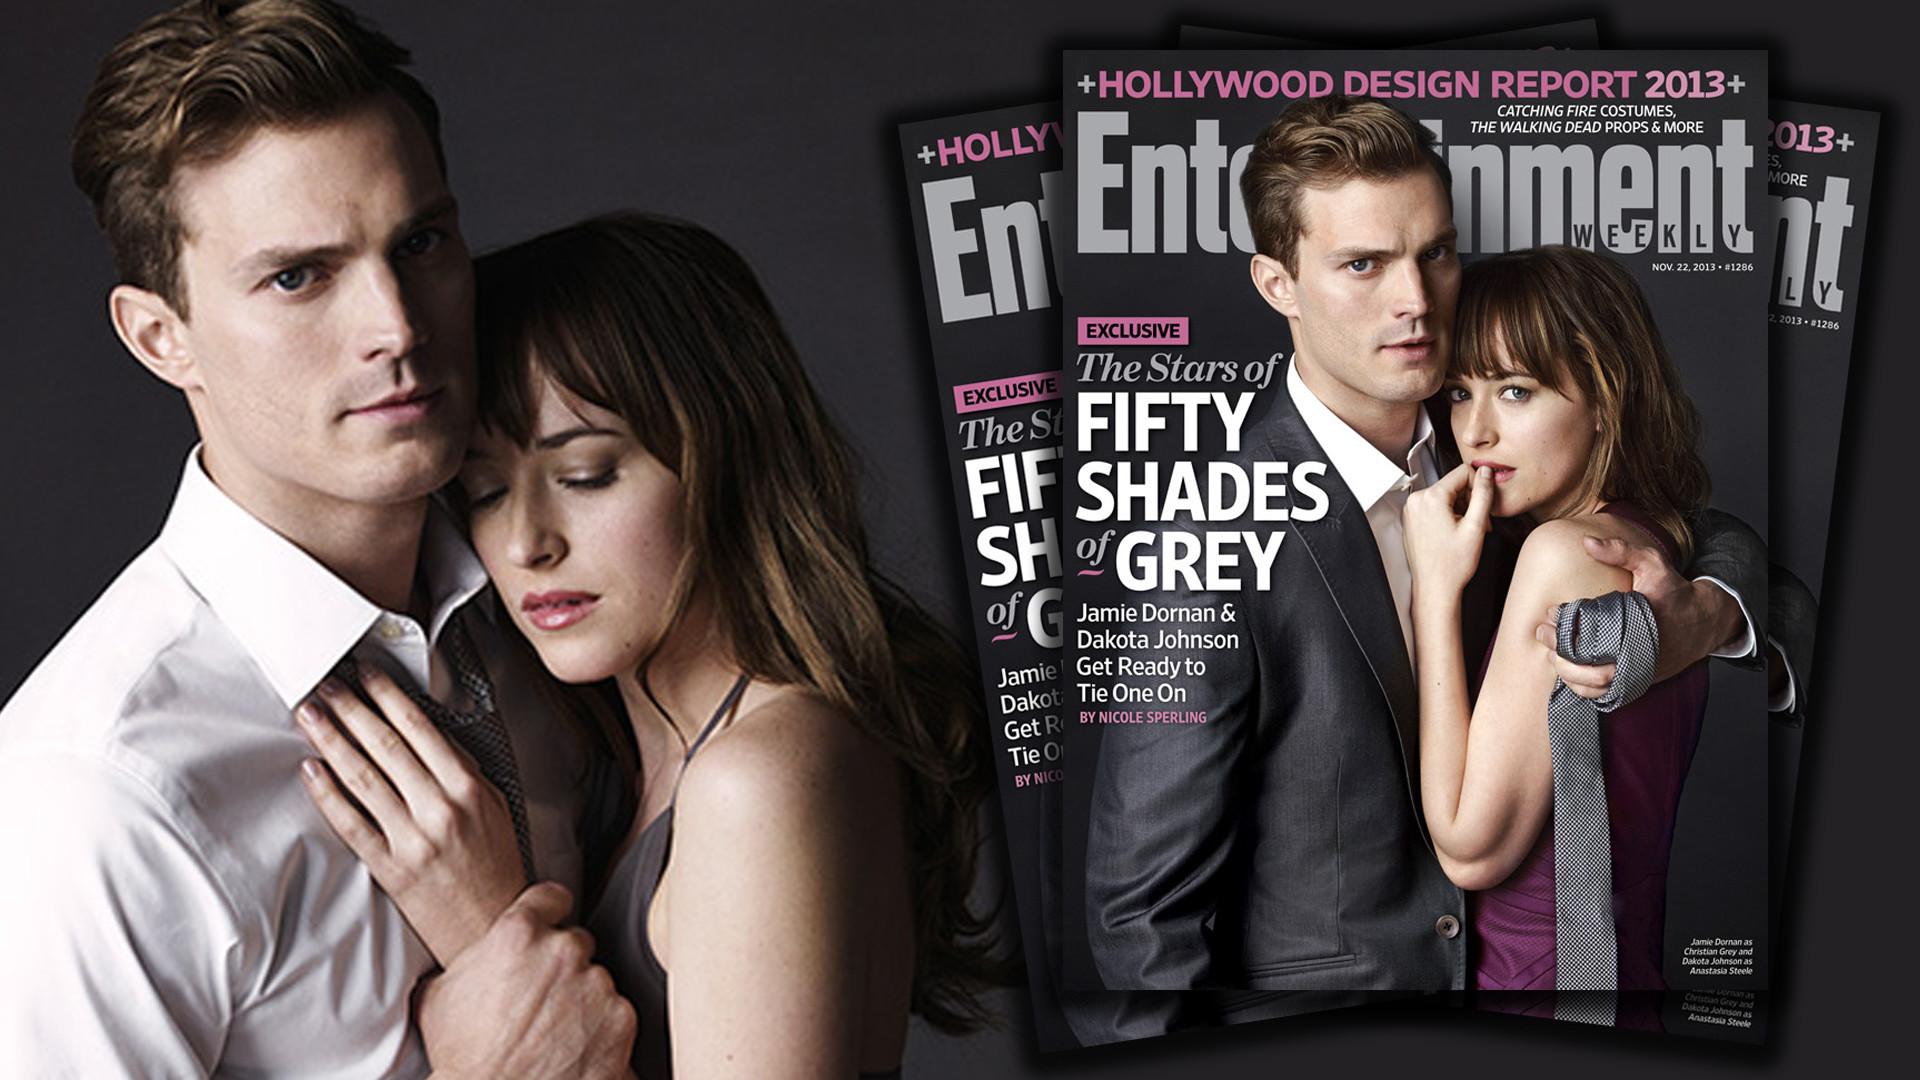 Fifty Shades of Grey   50 Shades of grey   Fifty shades of grey movie  